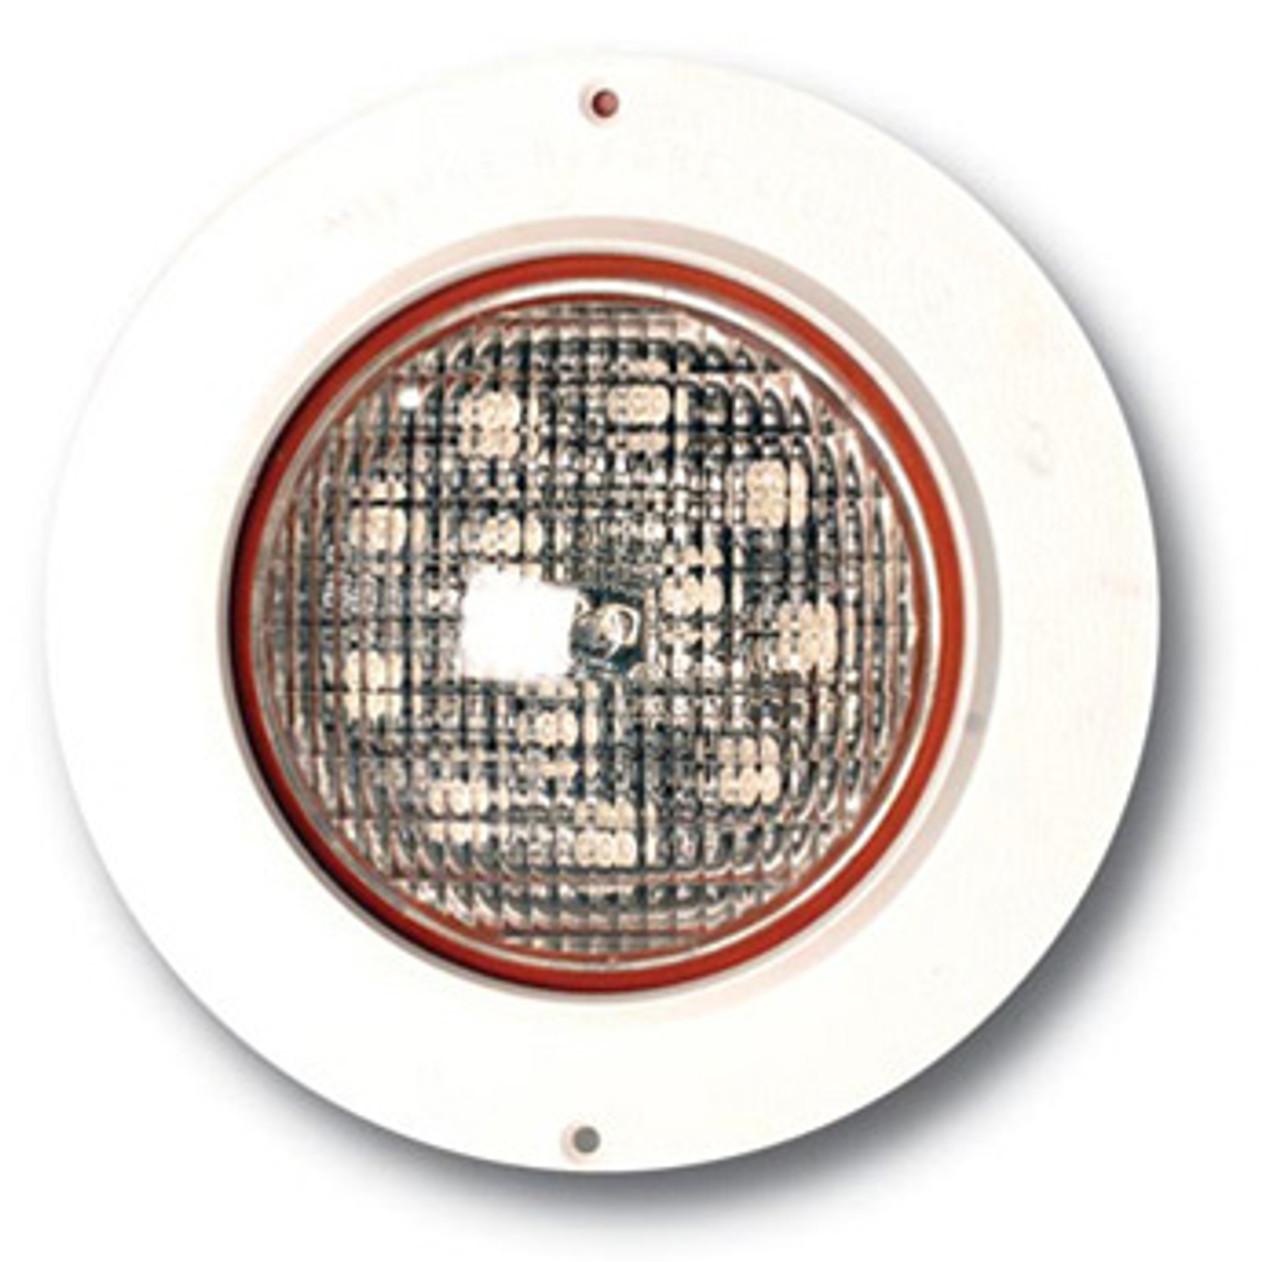 Certikin Ultra Bright LT LED Swimming Pool Lights